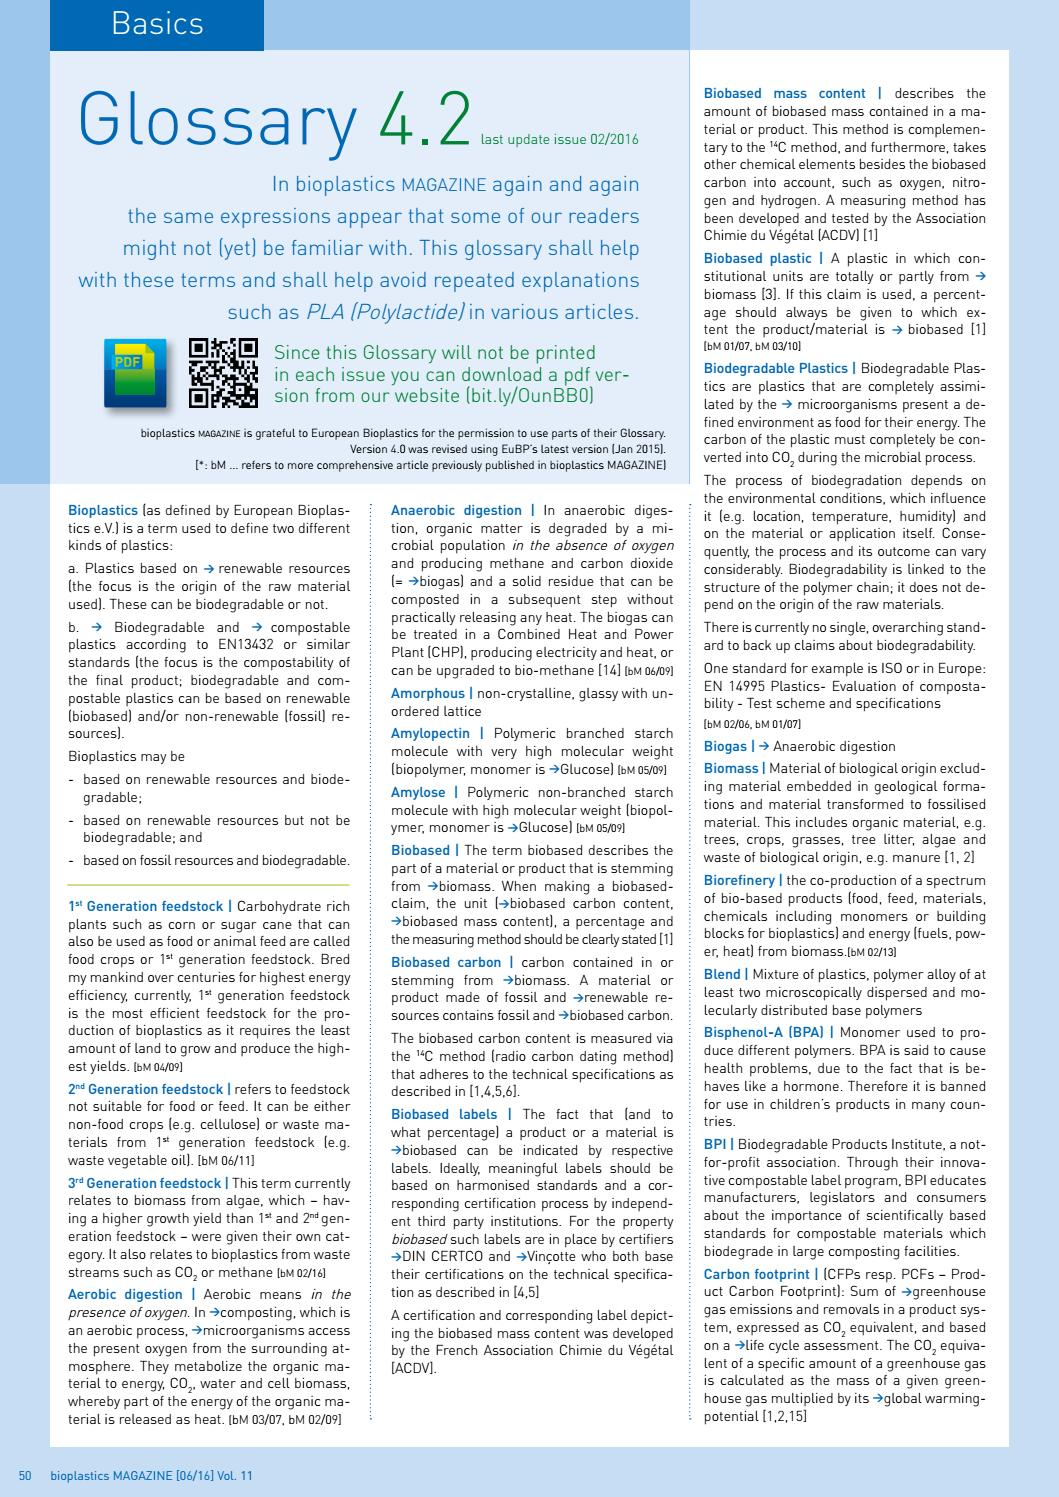 bioplastics MAGAZINE 06-2016 by bioplastics MAGAZINE - issuu